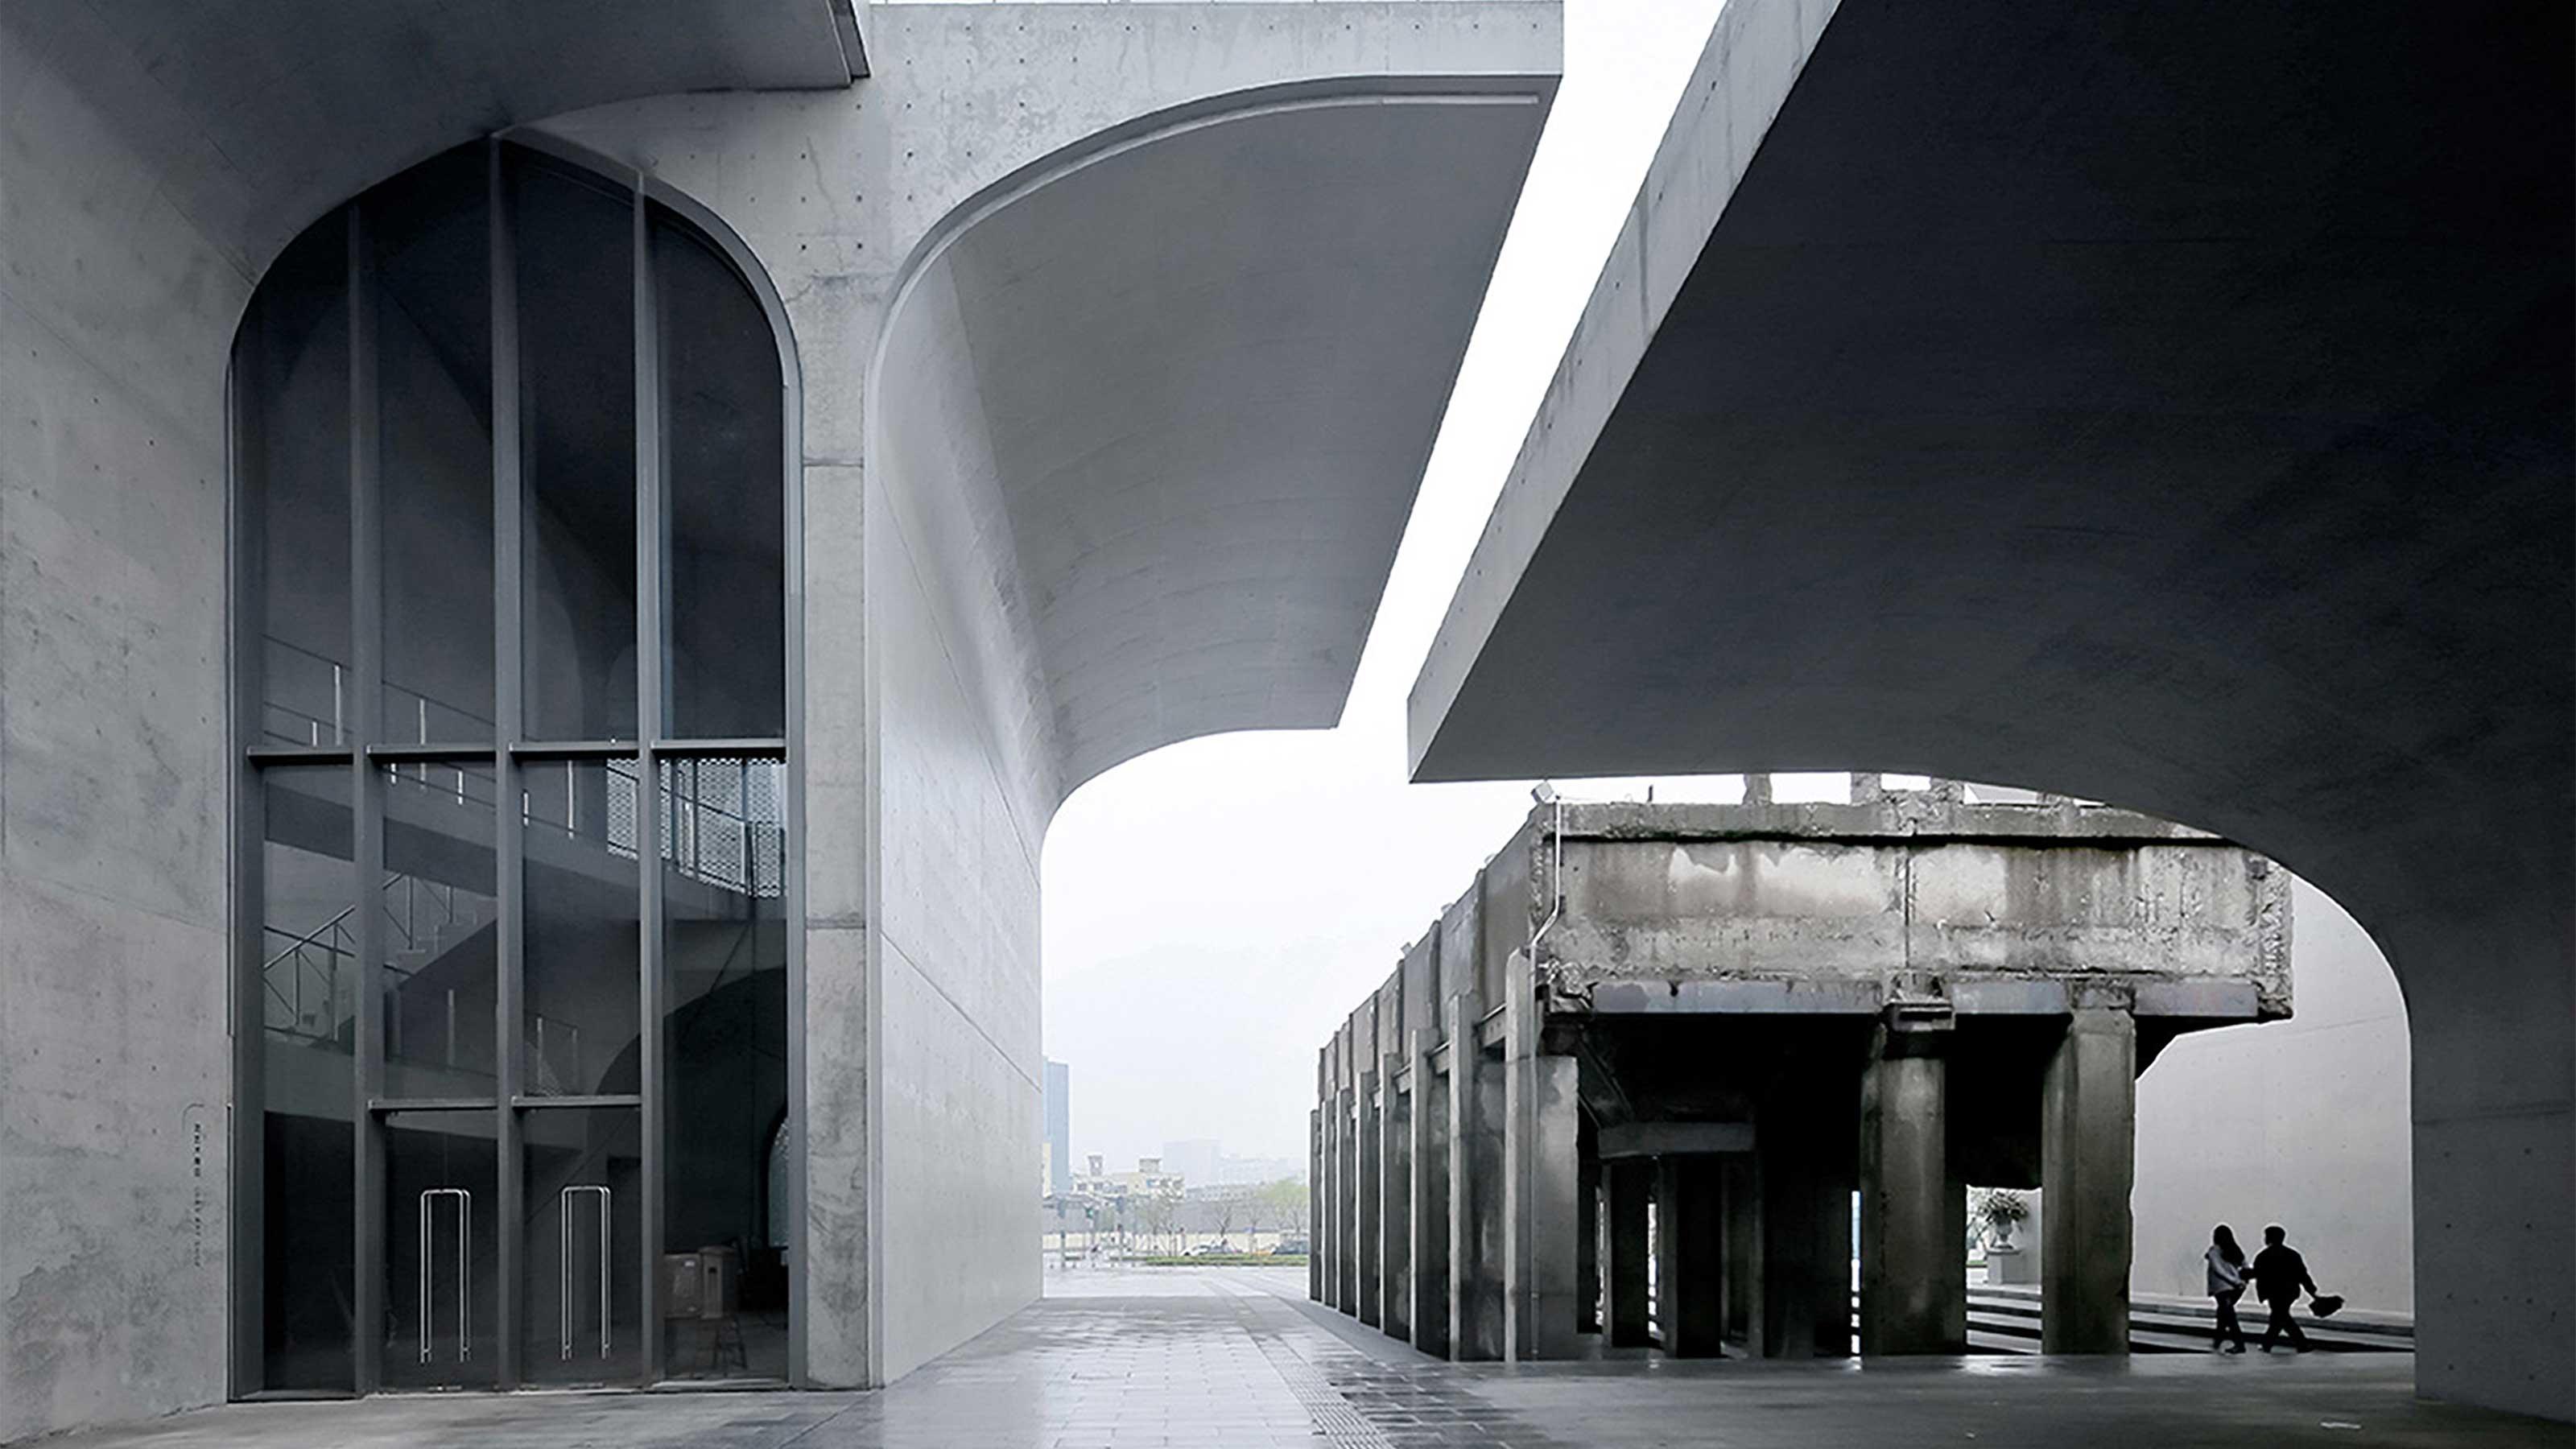 Works by Niyoko Ikuta and Satoru Ozaki acquired by the Long Museum, Shanghai